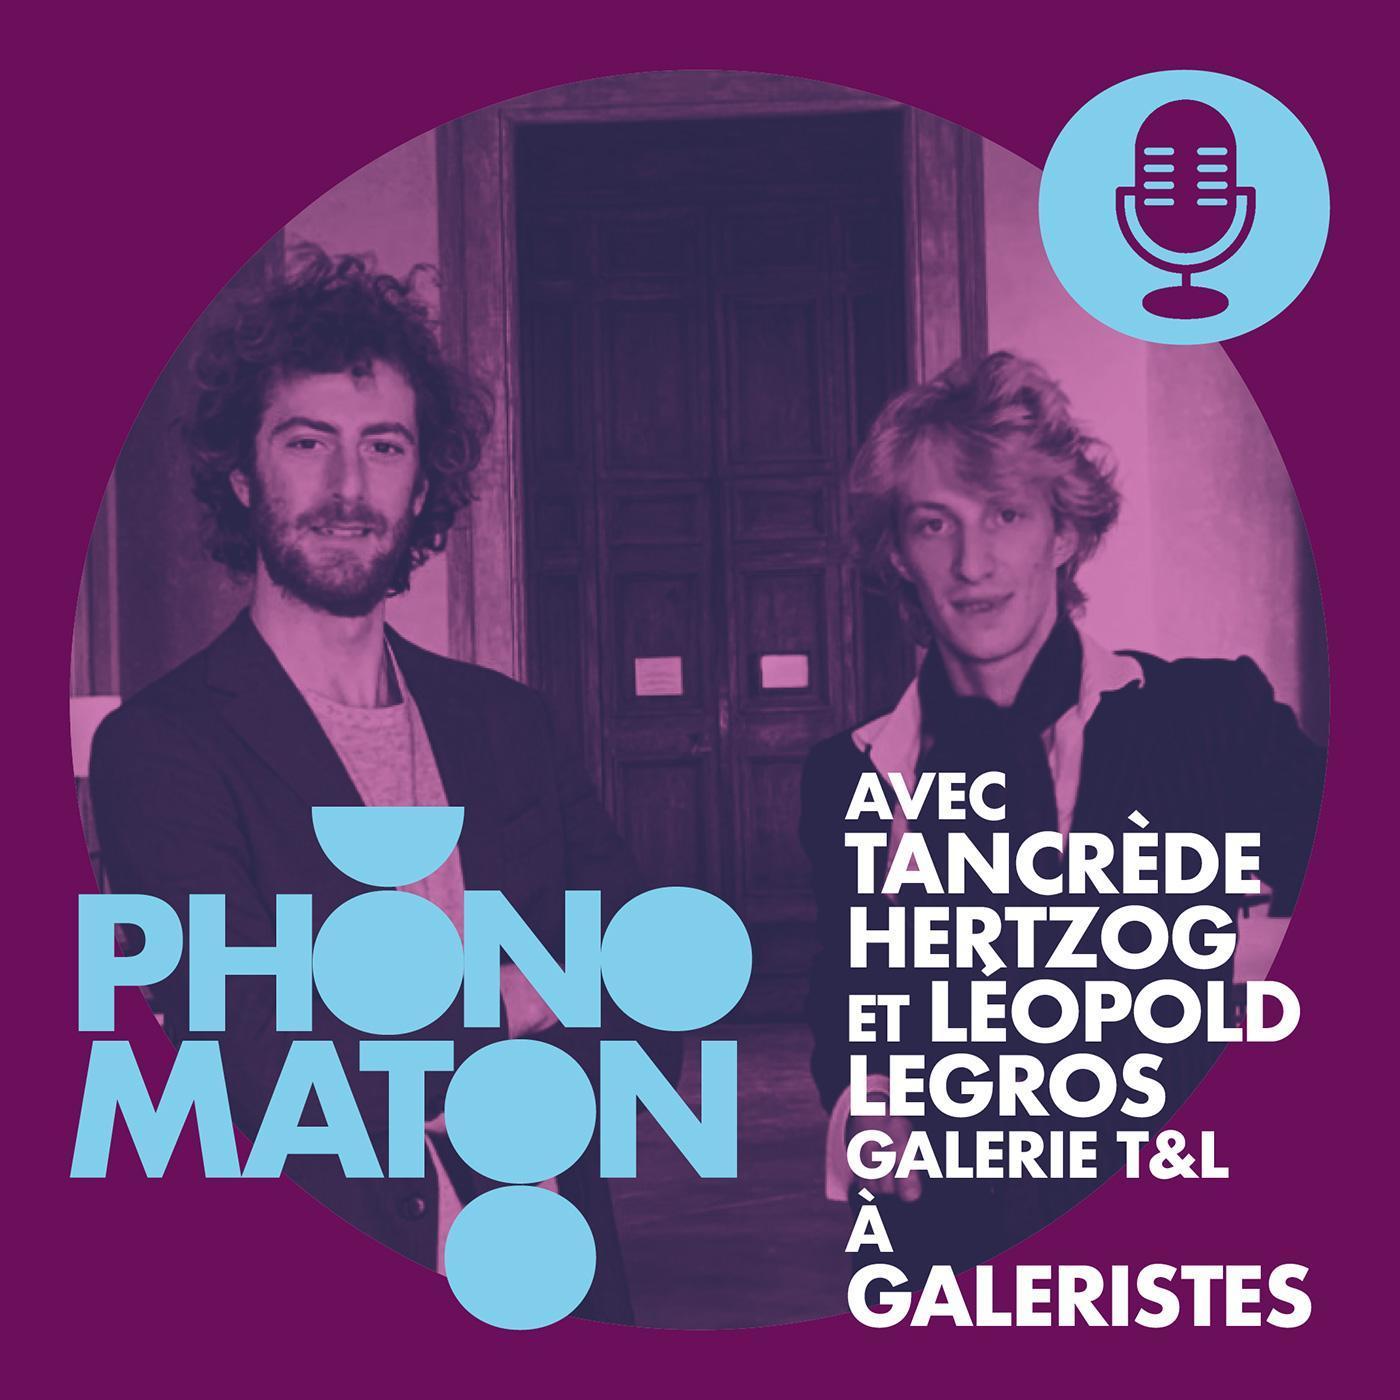 Phonomaton à Galeristes avec Tancrède Hertzog et Léopold Legros